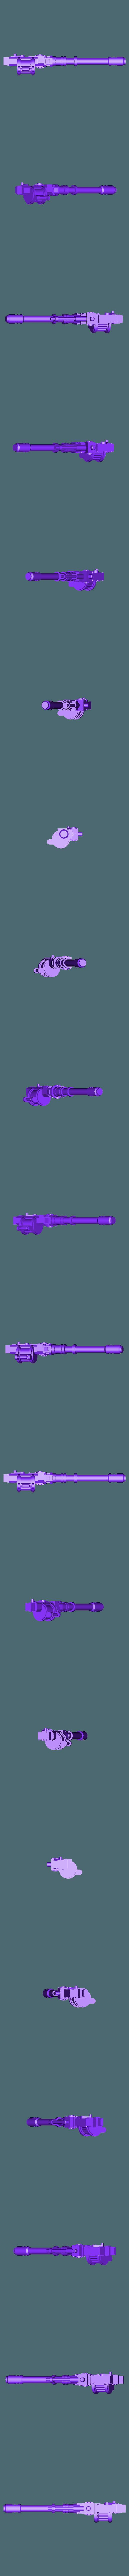 Autocannon.stl Download free STL file Autocannon (Heavy weapons team) • 3D print model, Solutionlesn